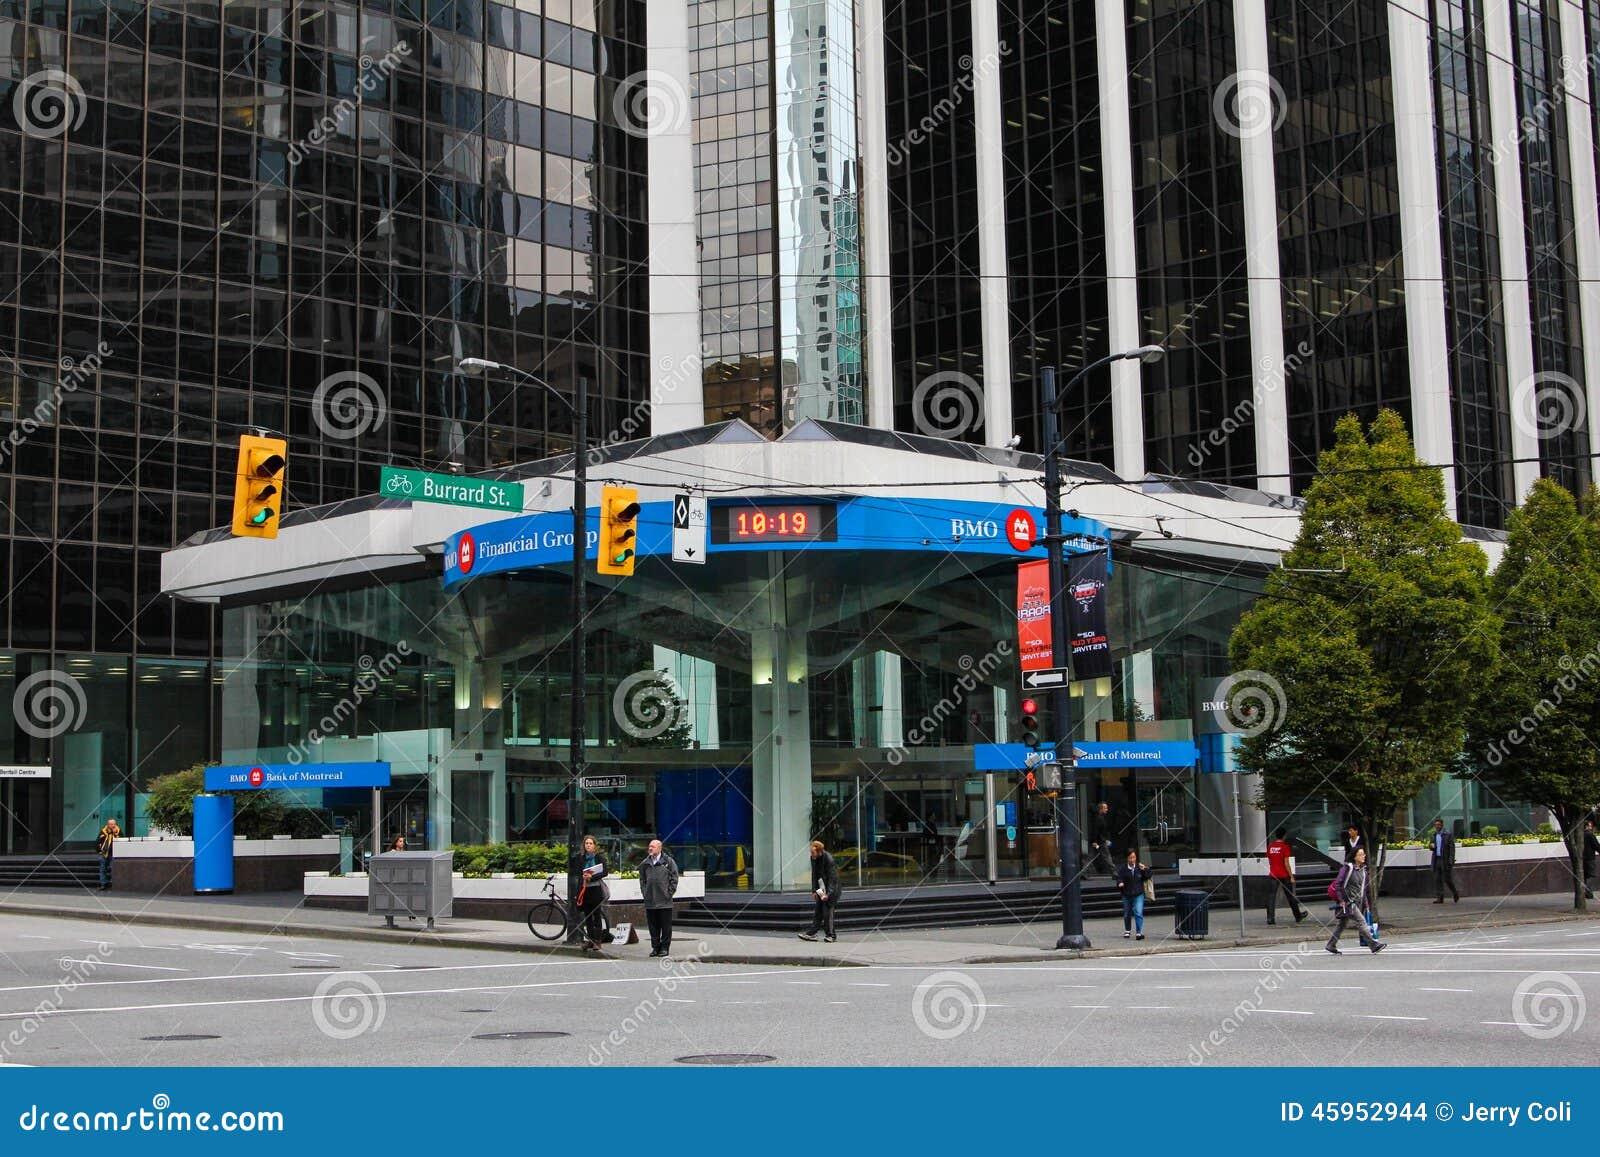 Ontario Banks: Banks in Ontario, Canada